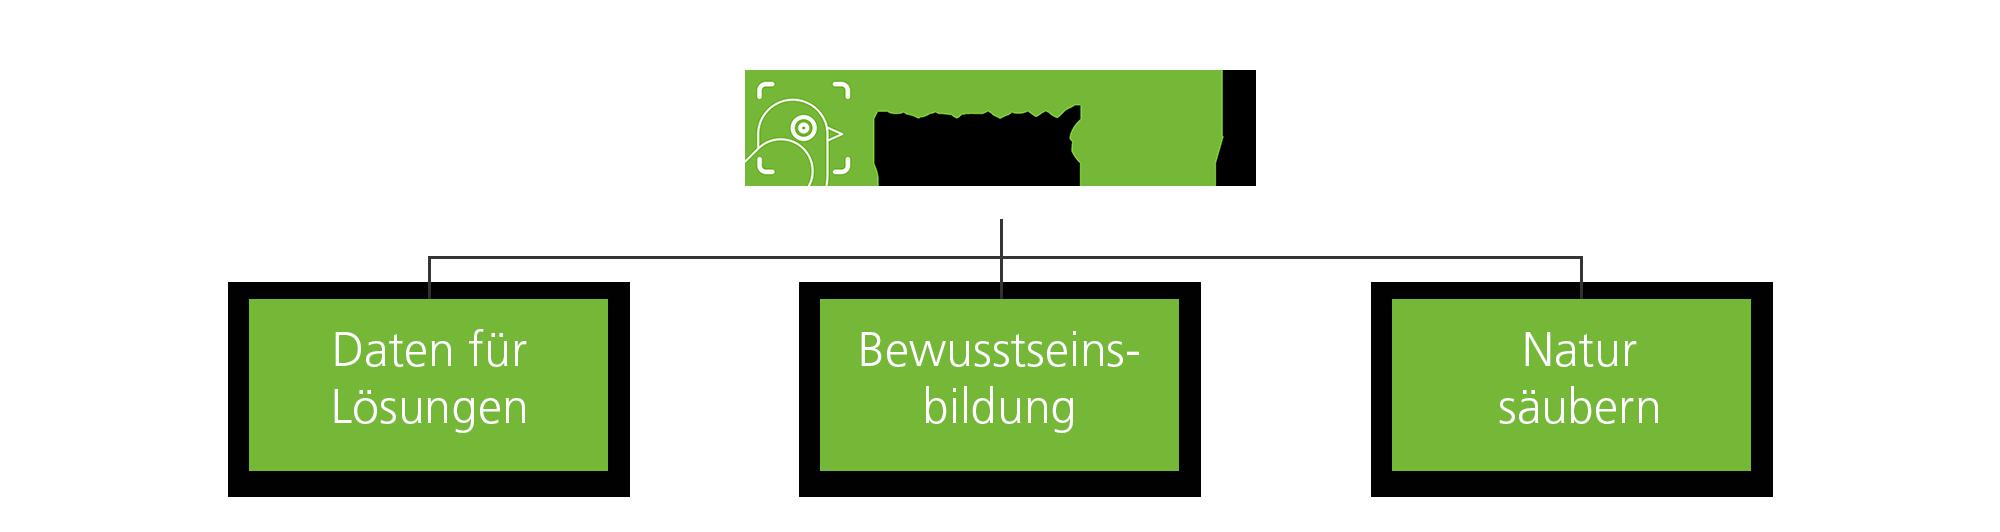 DreckSpotz App Ziele